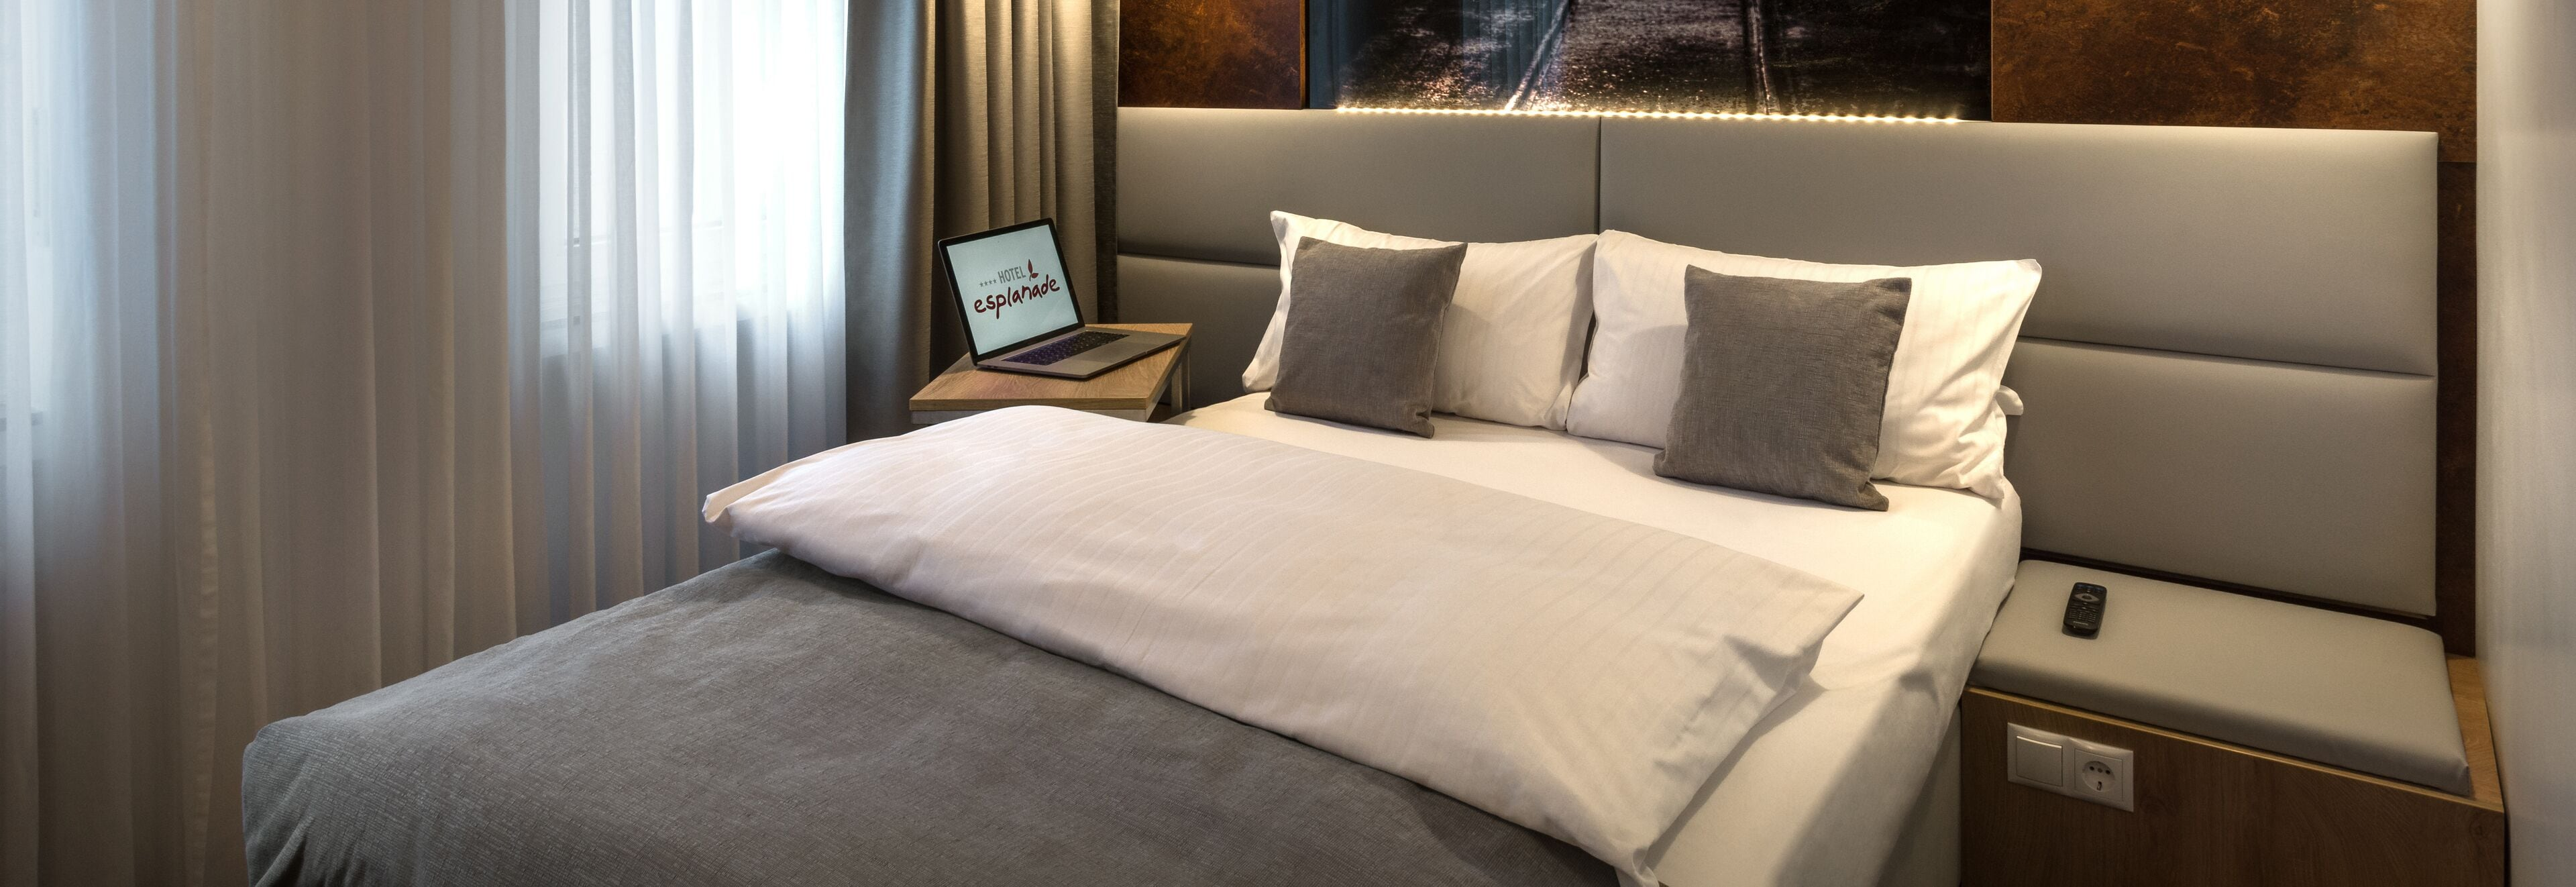 TOP Hotel Esplanade Dortmund